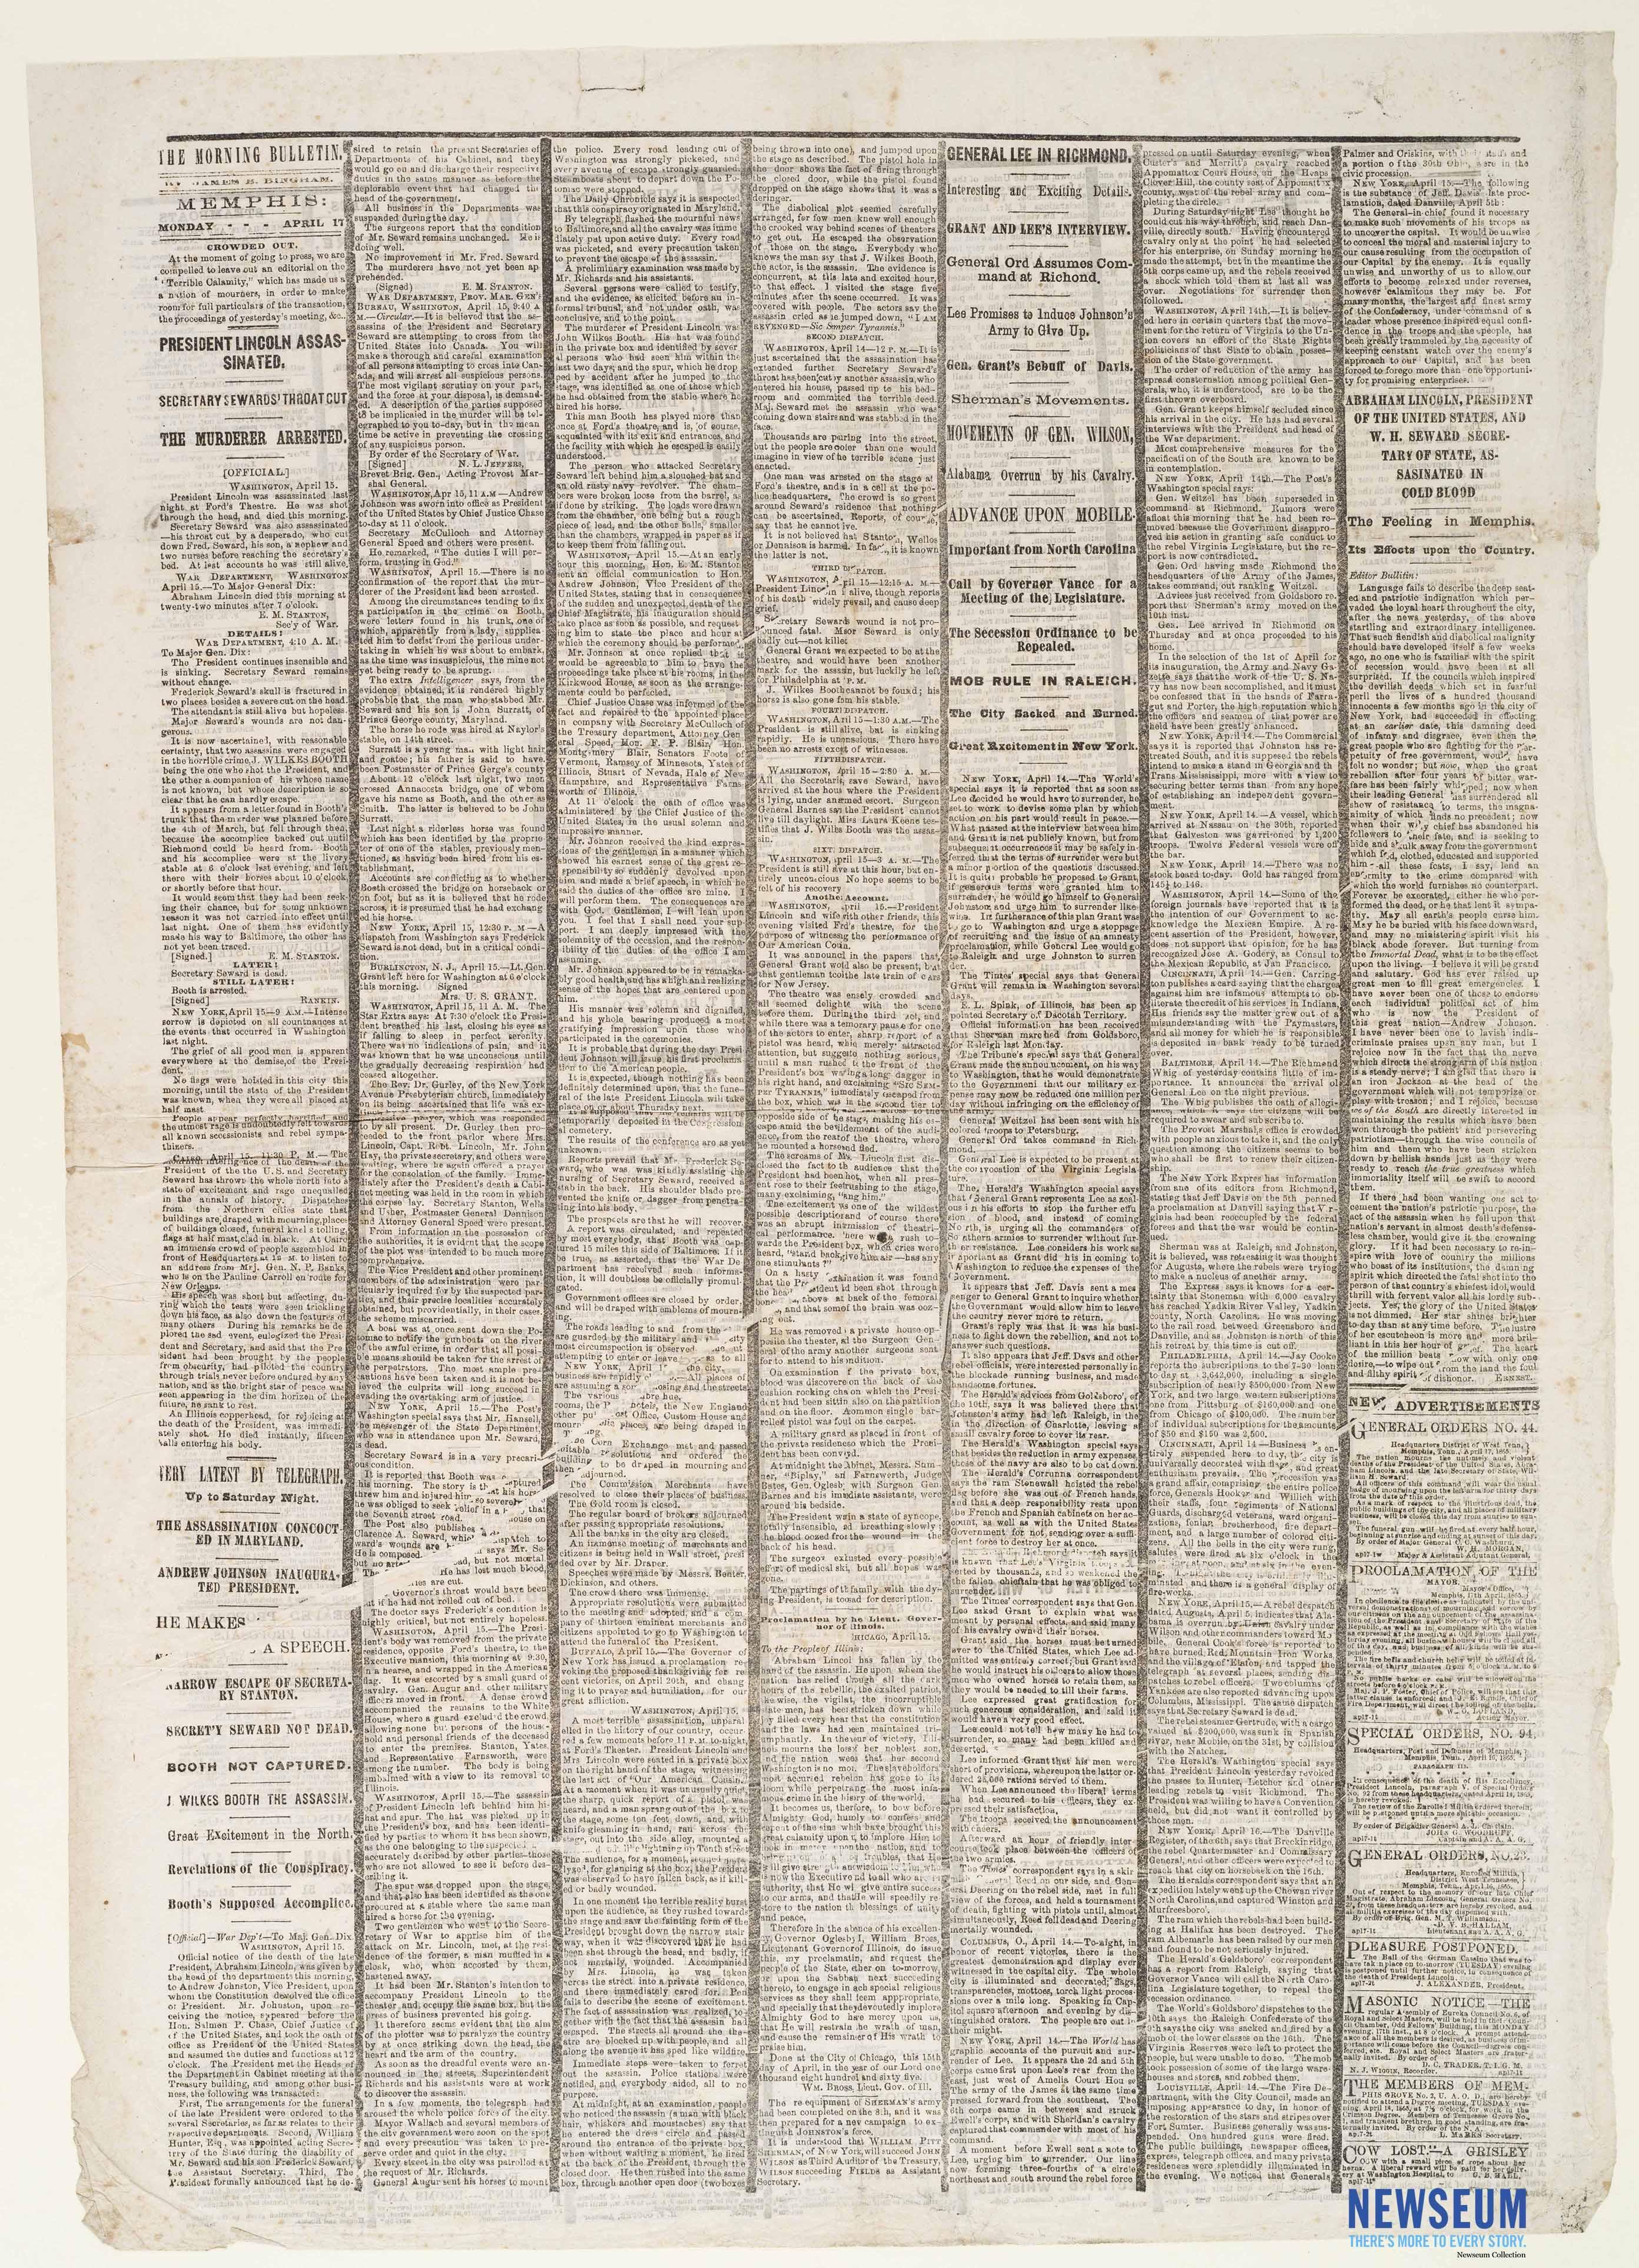 The Morning Bulletin, April 17, [1865]